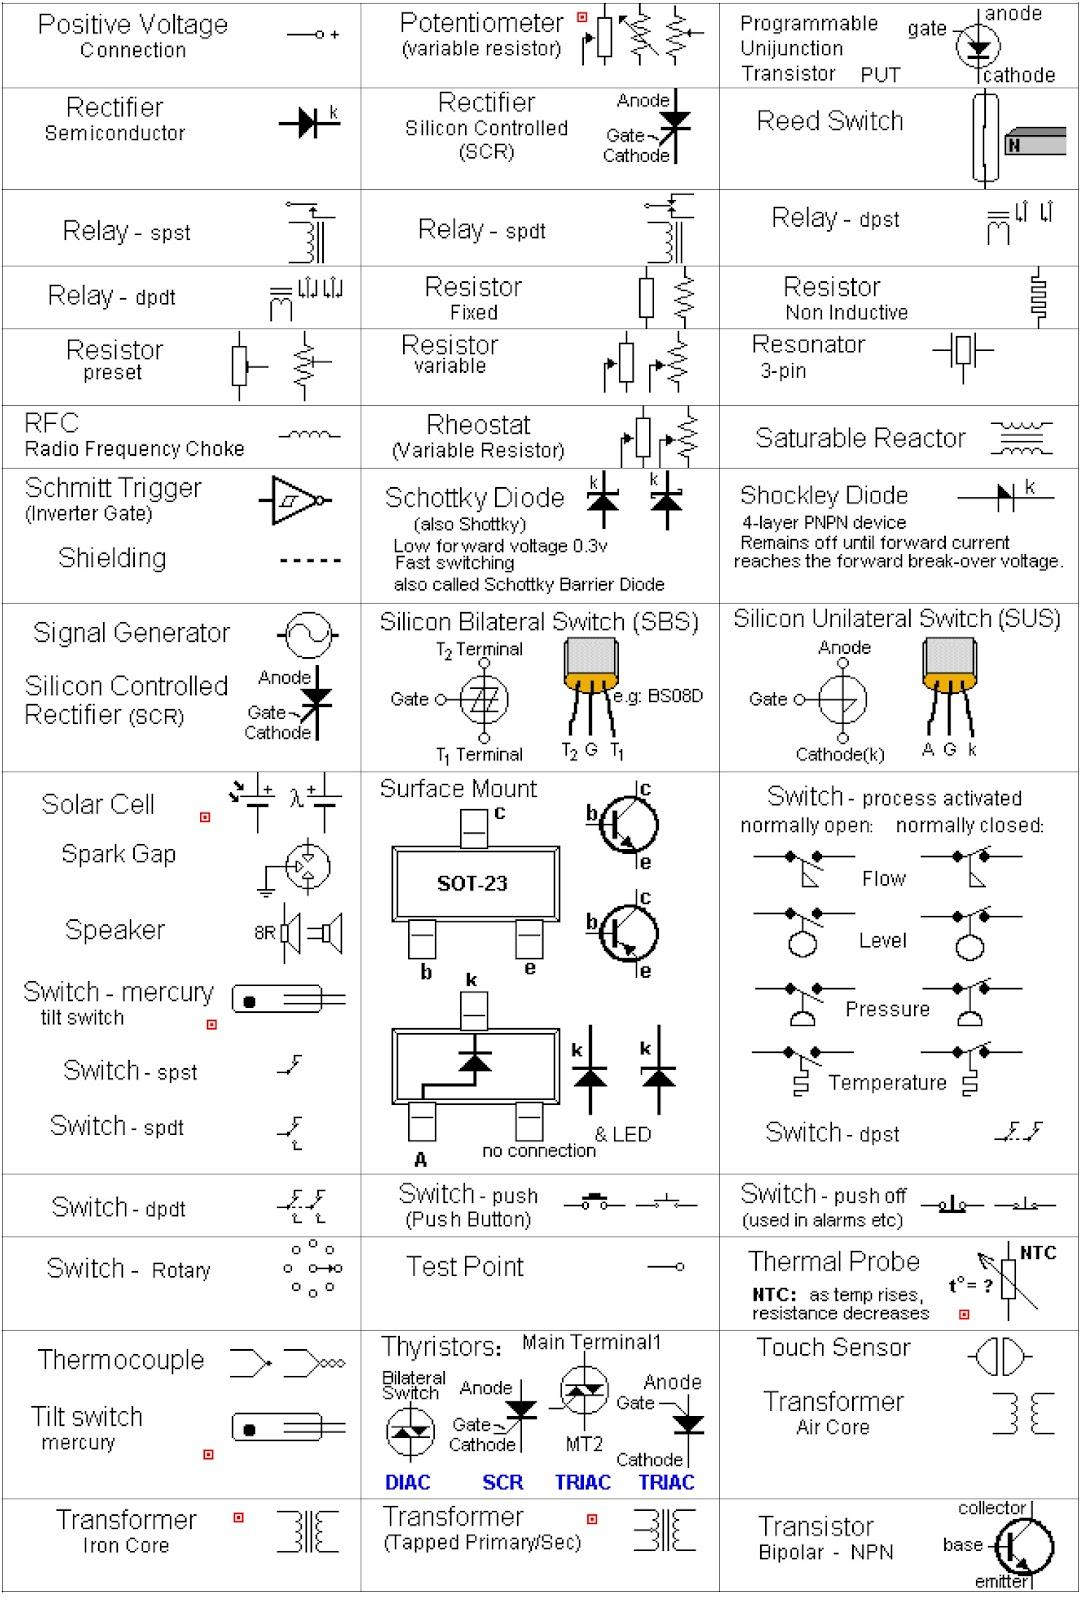 Wiring Diagram Standards Centrifugal Pump Mechanical Seal Electrical Color Code Imageresizertool Com